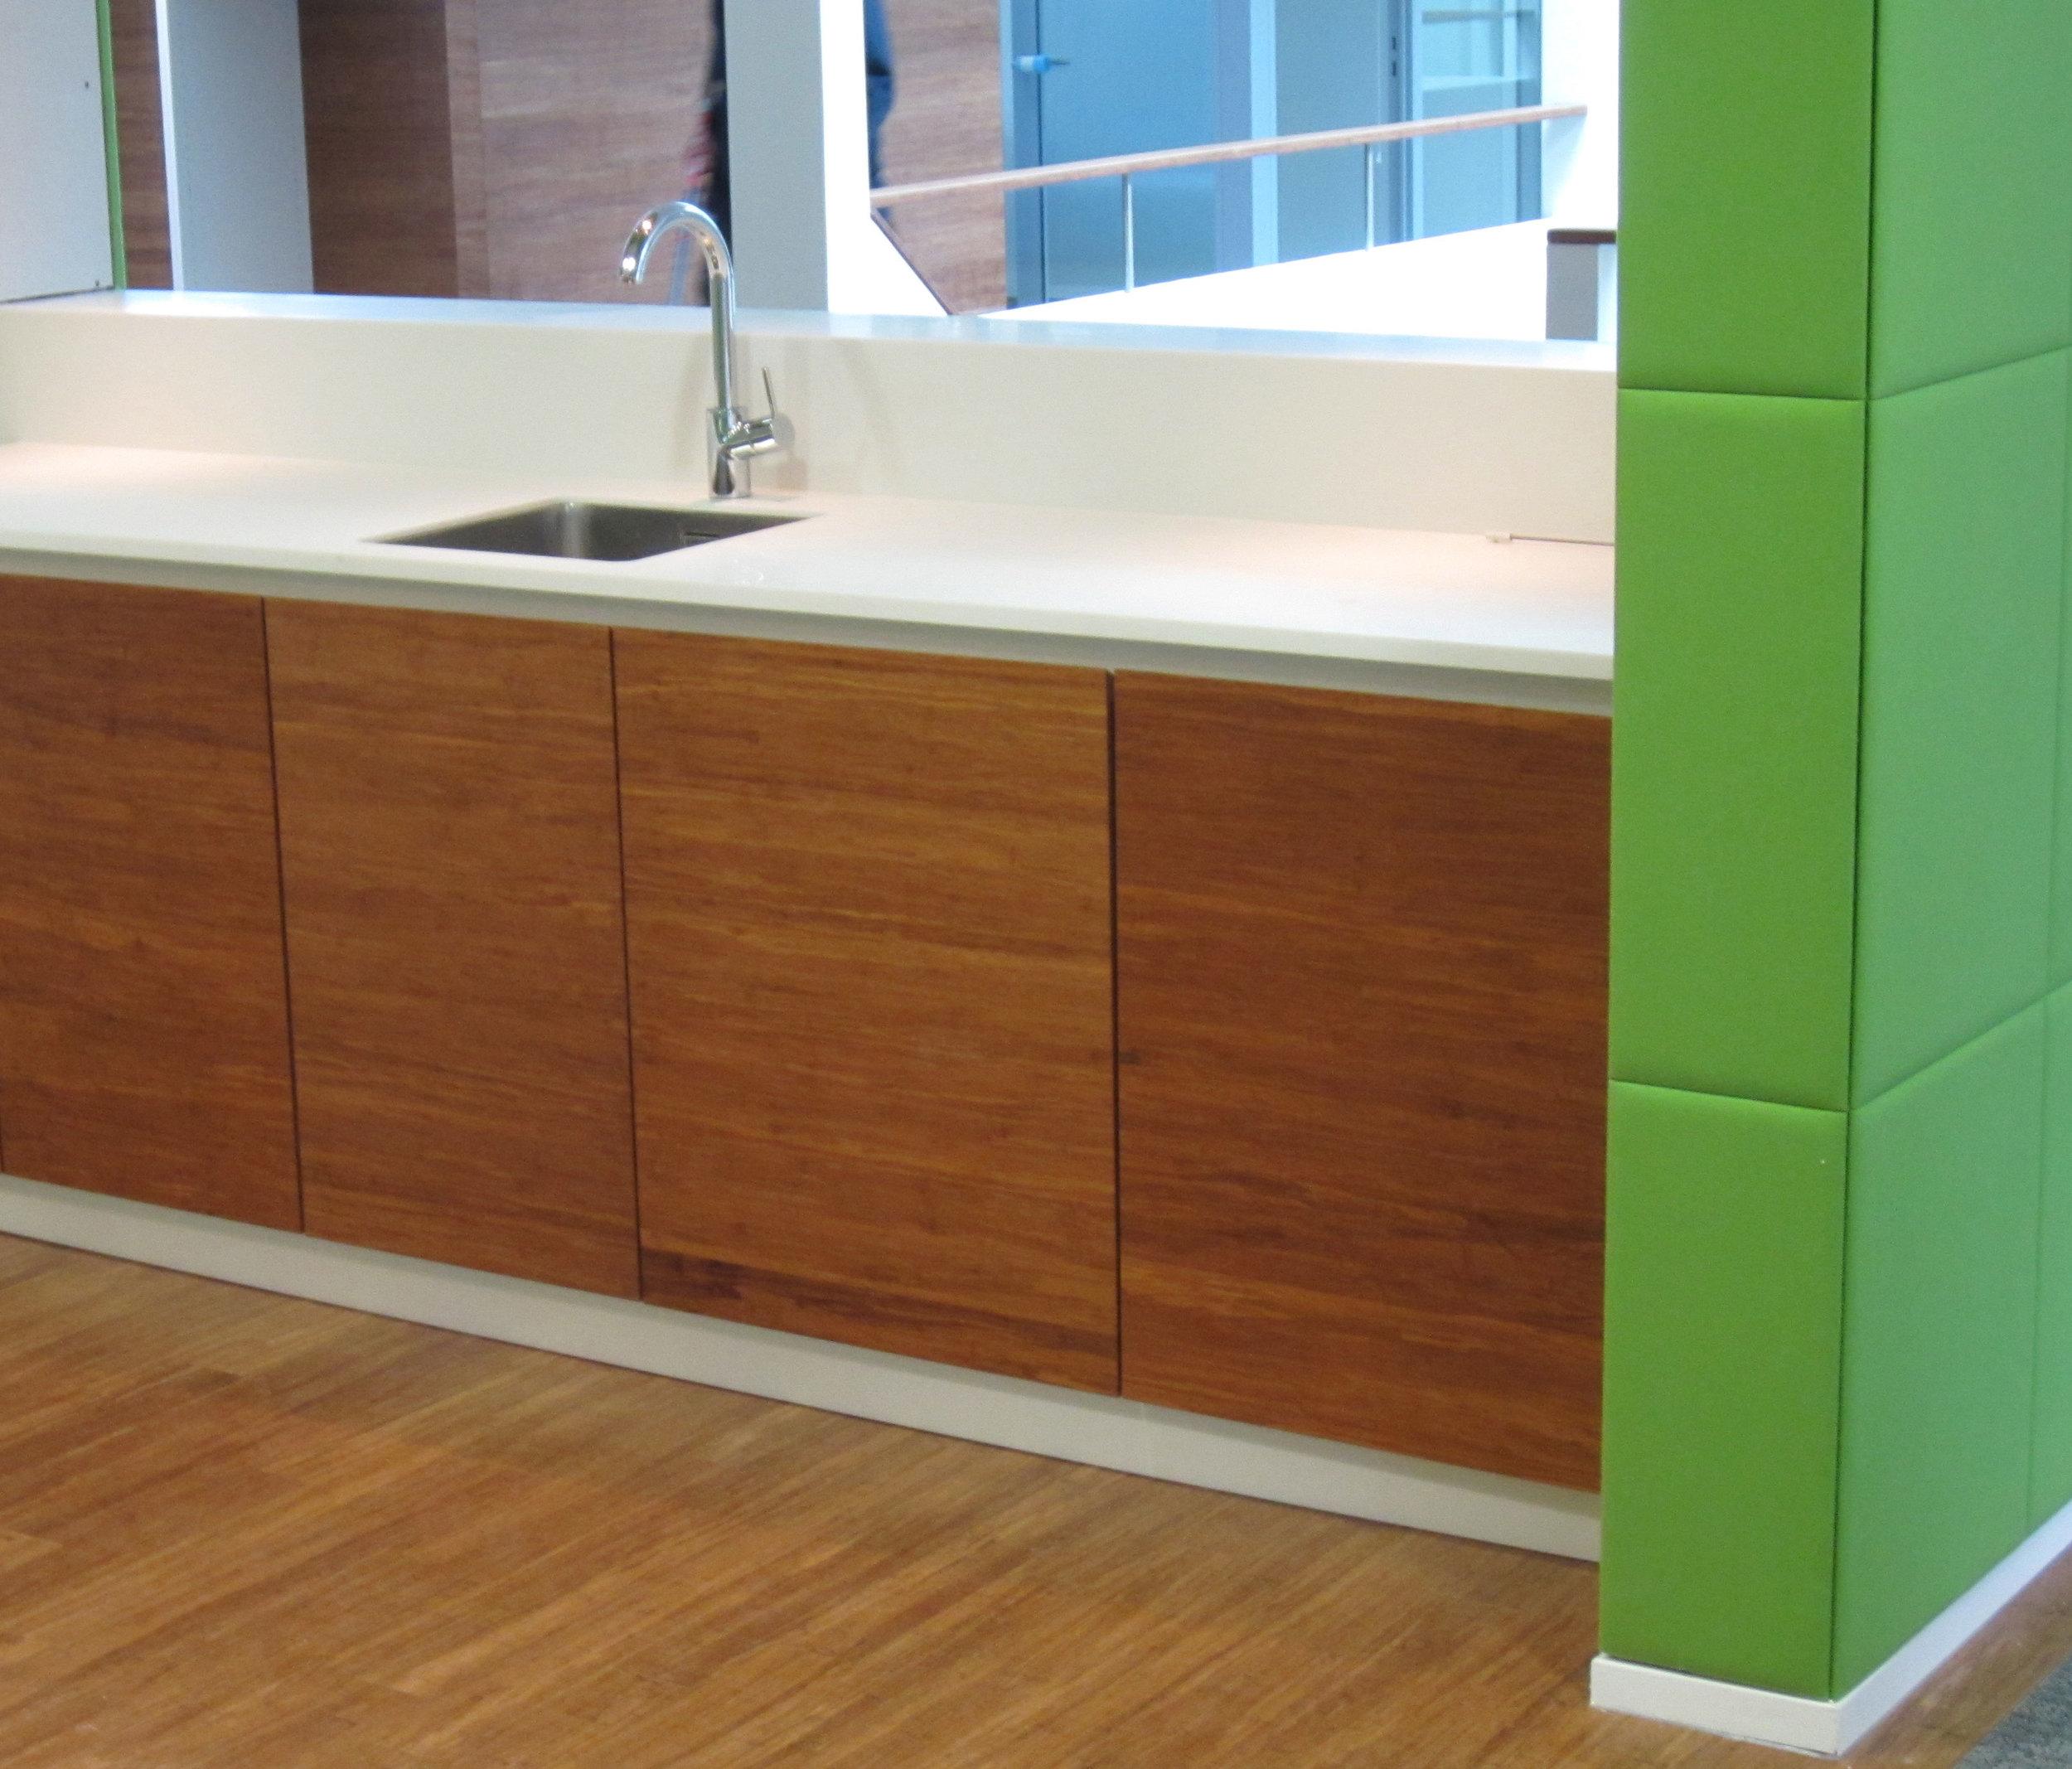 KOSA-bamboo-keuken-fronten.jpg